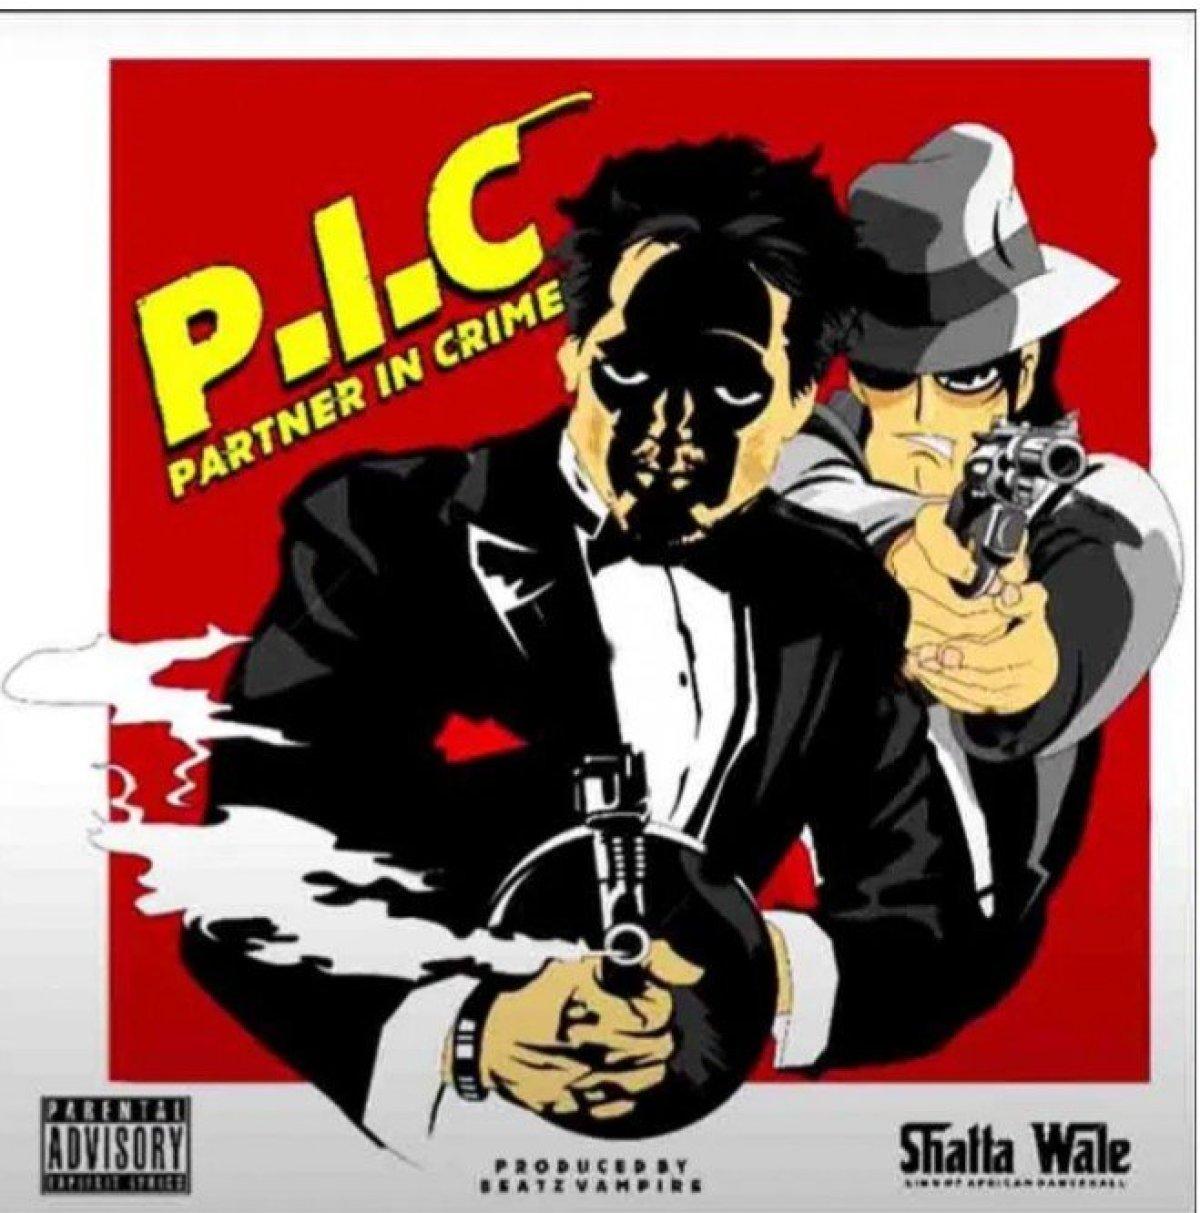 DOWNLOAD MP3: Shatta Wale – Partner In Crime (P.I.C)